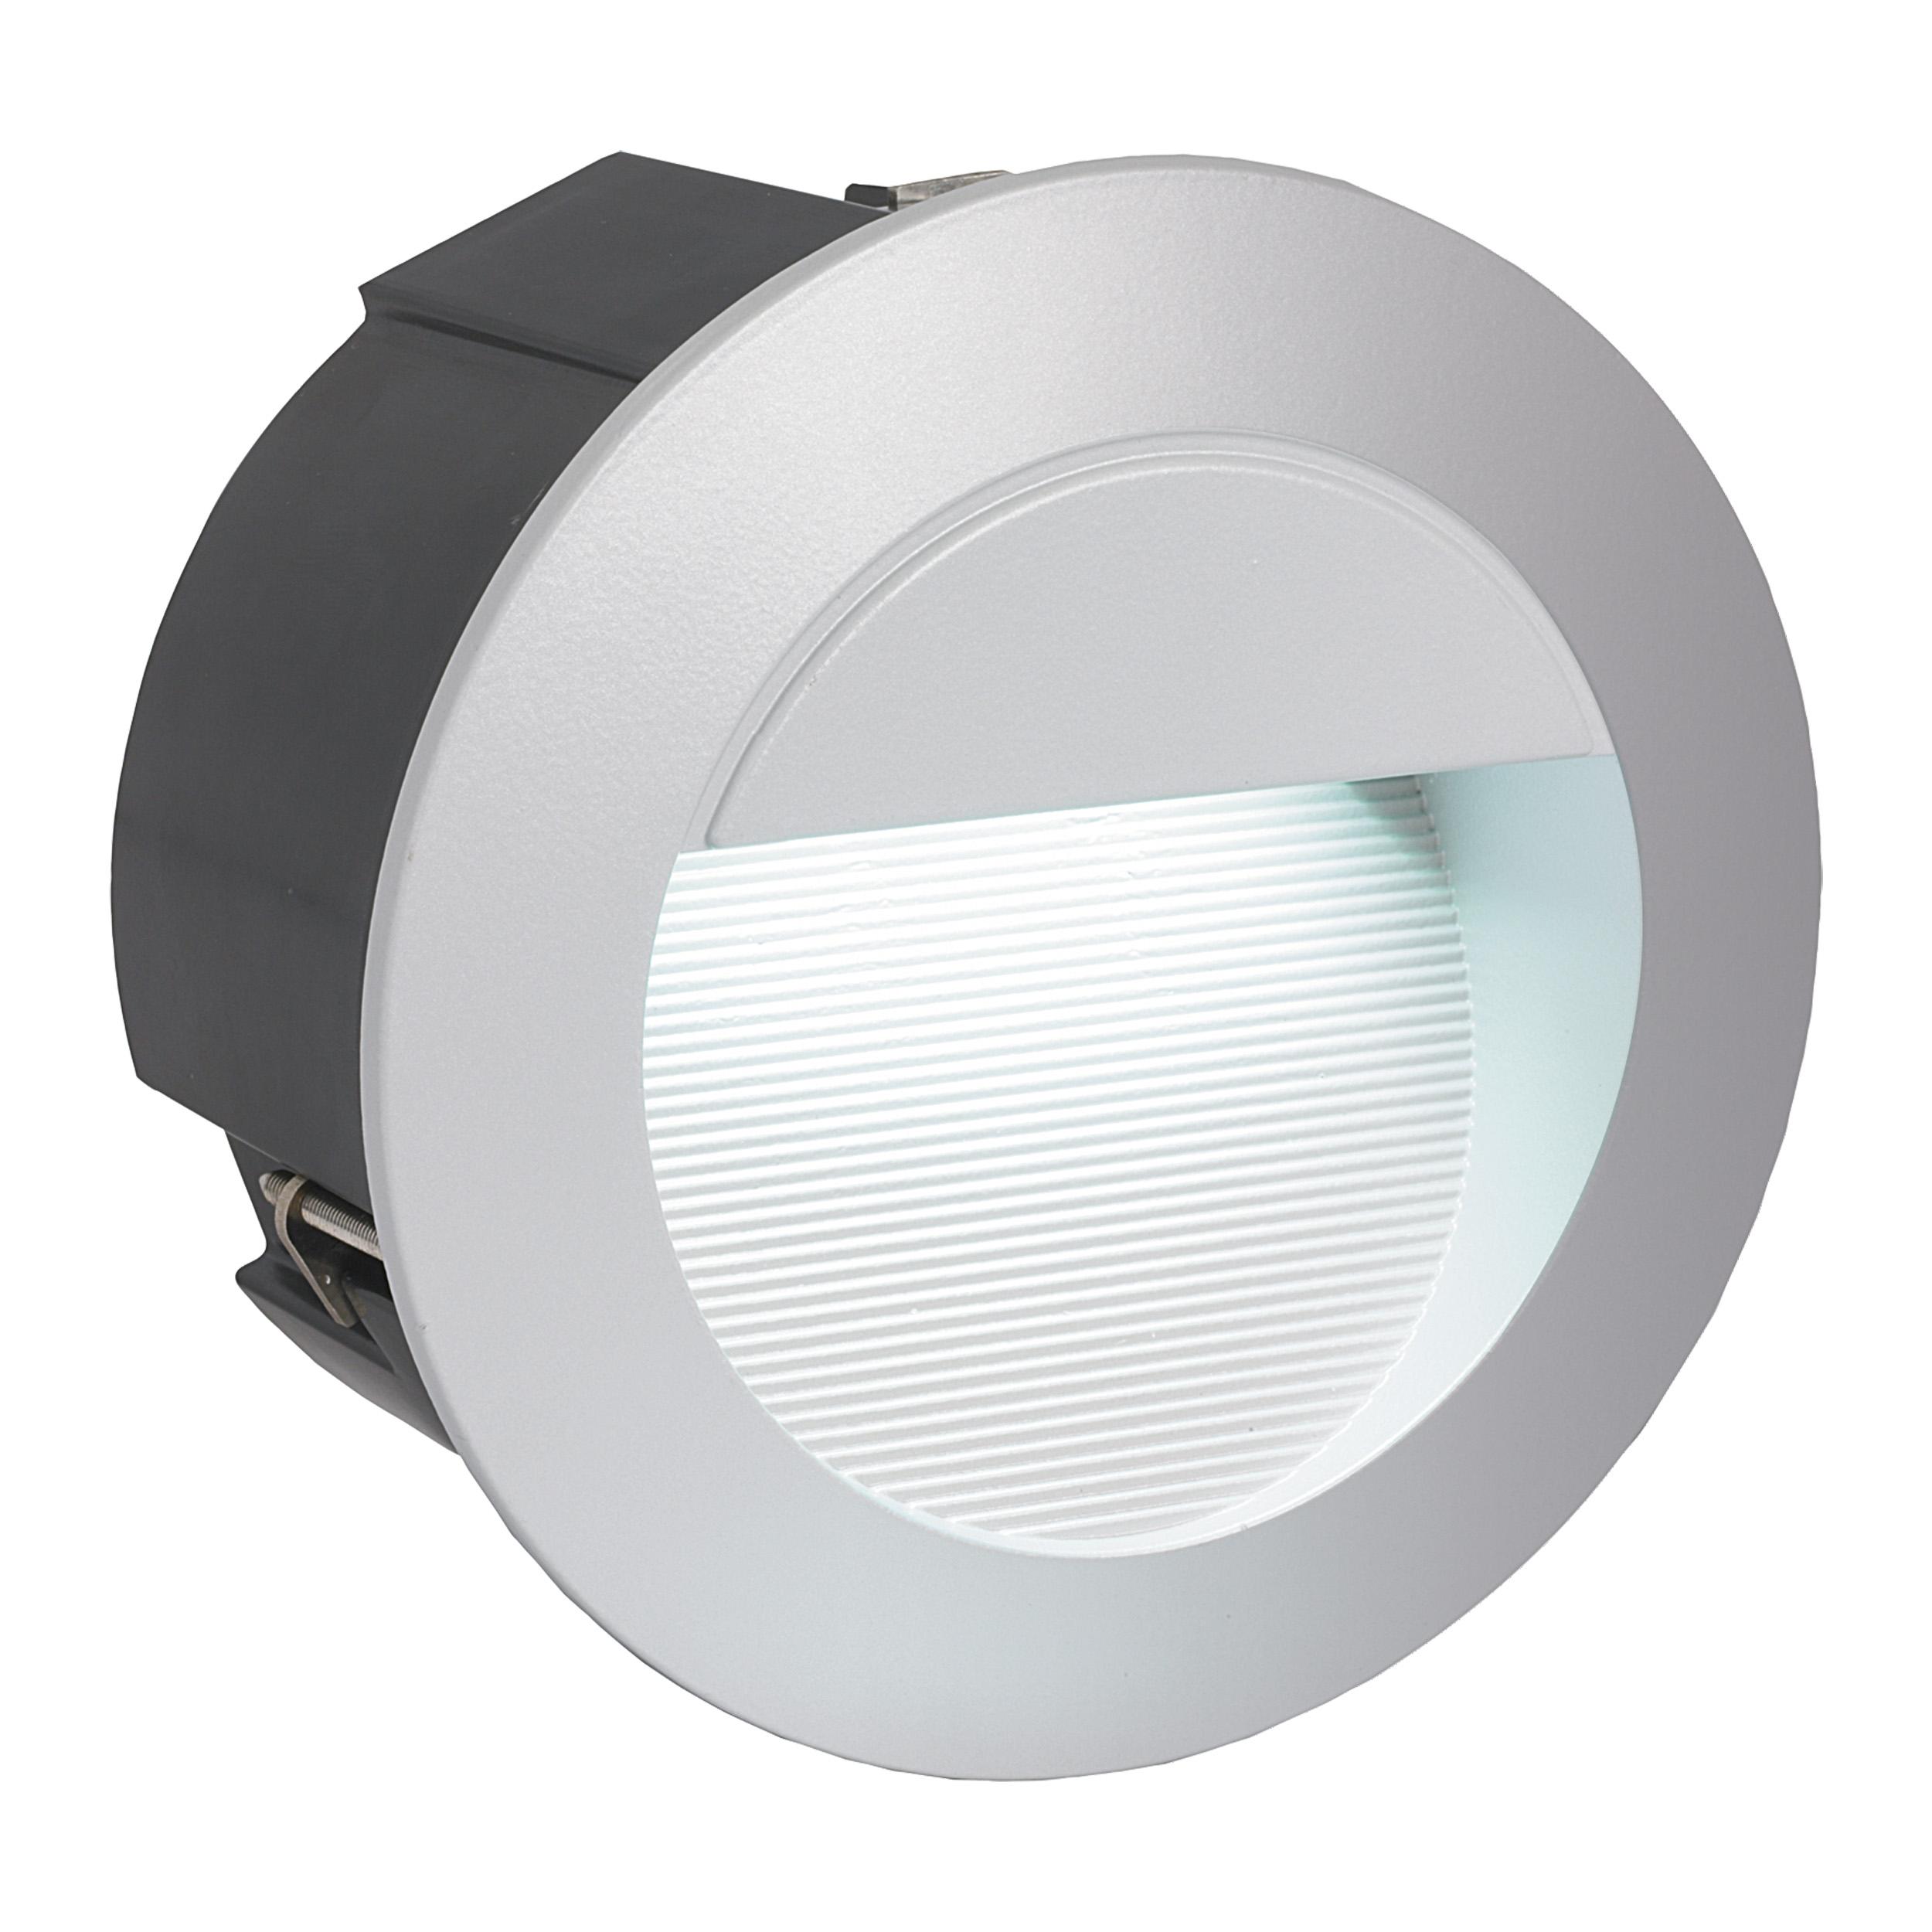 1 Stk Wandeinbauleuchte Zimba-LED 4000K silber LI61767---